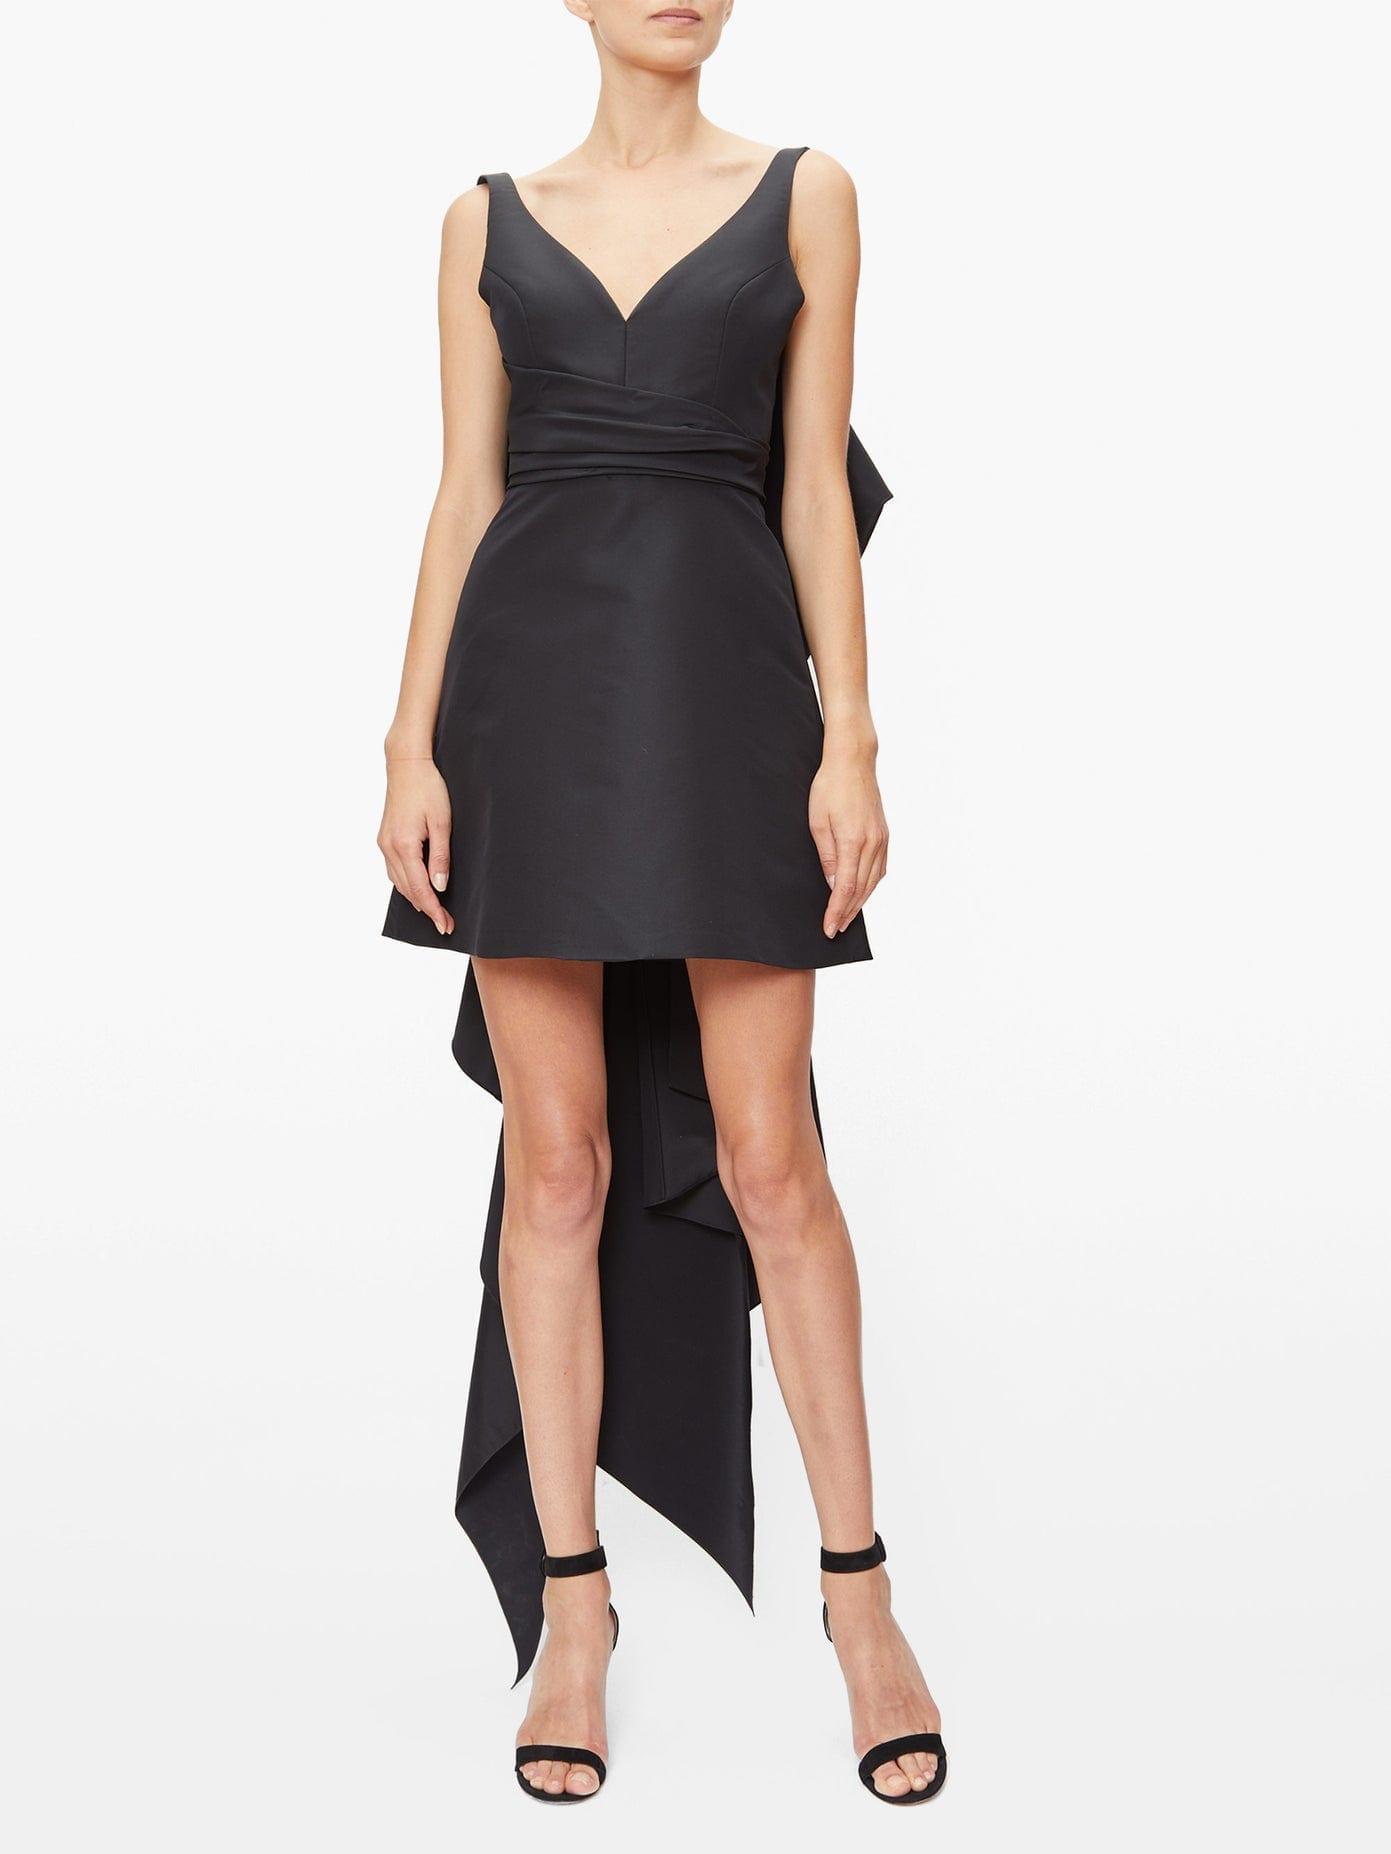 CAROLINA HERRERA Back-bow Faille Mini Dress